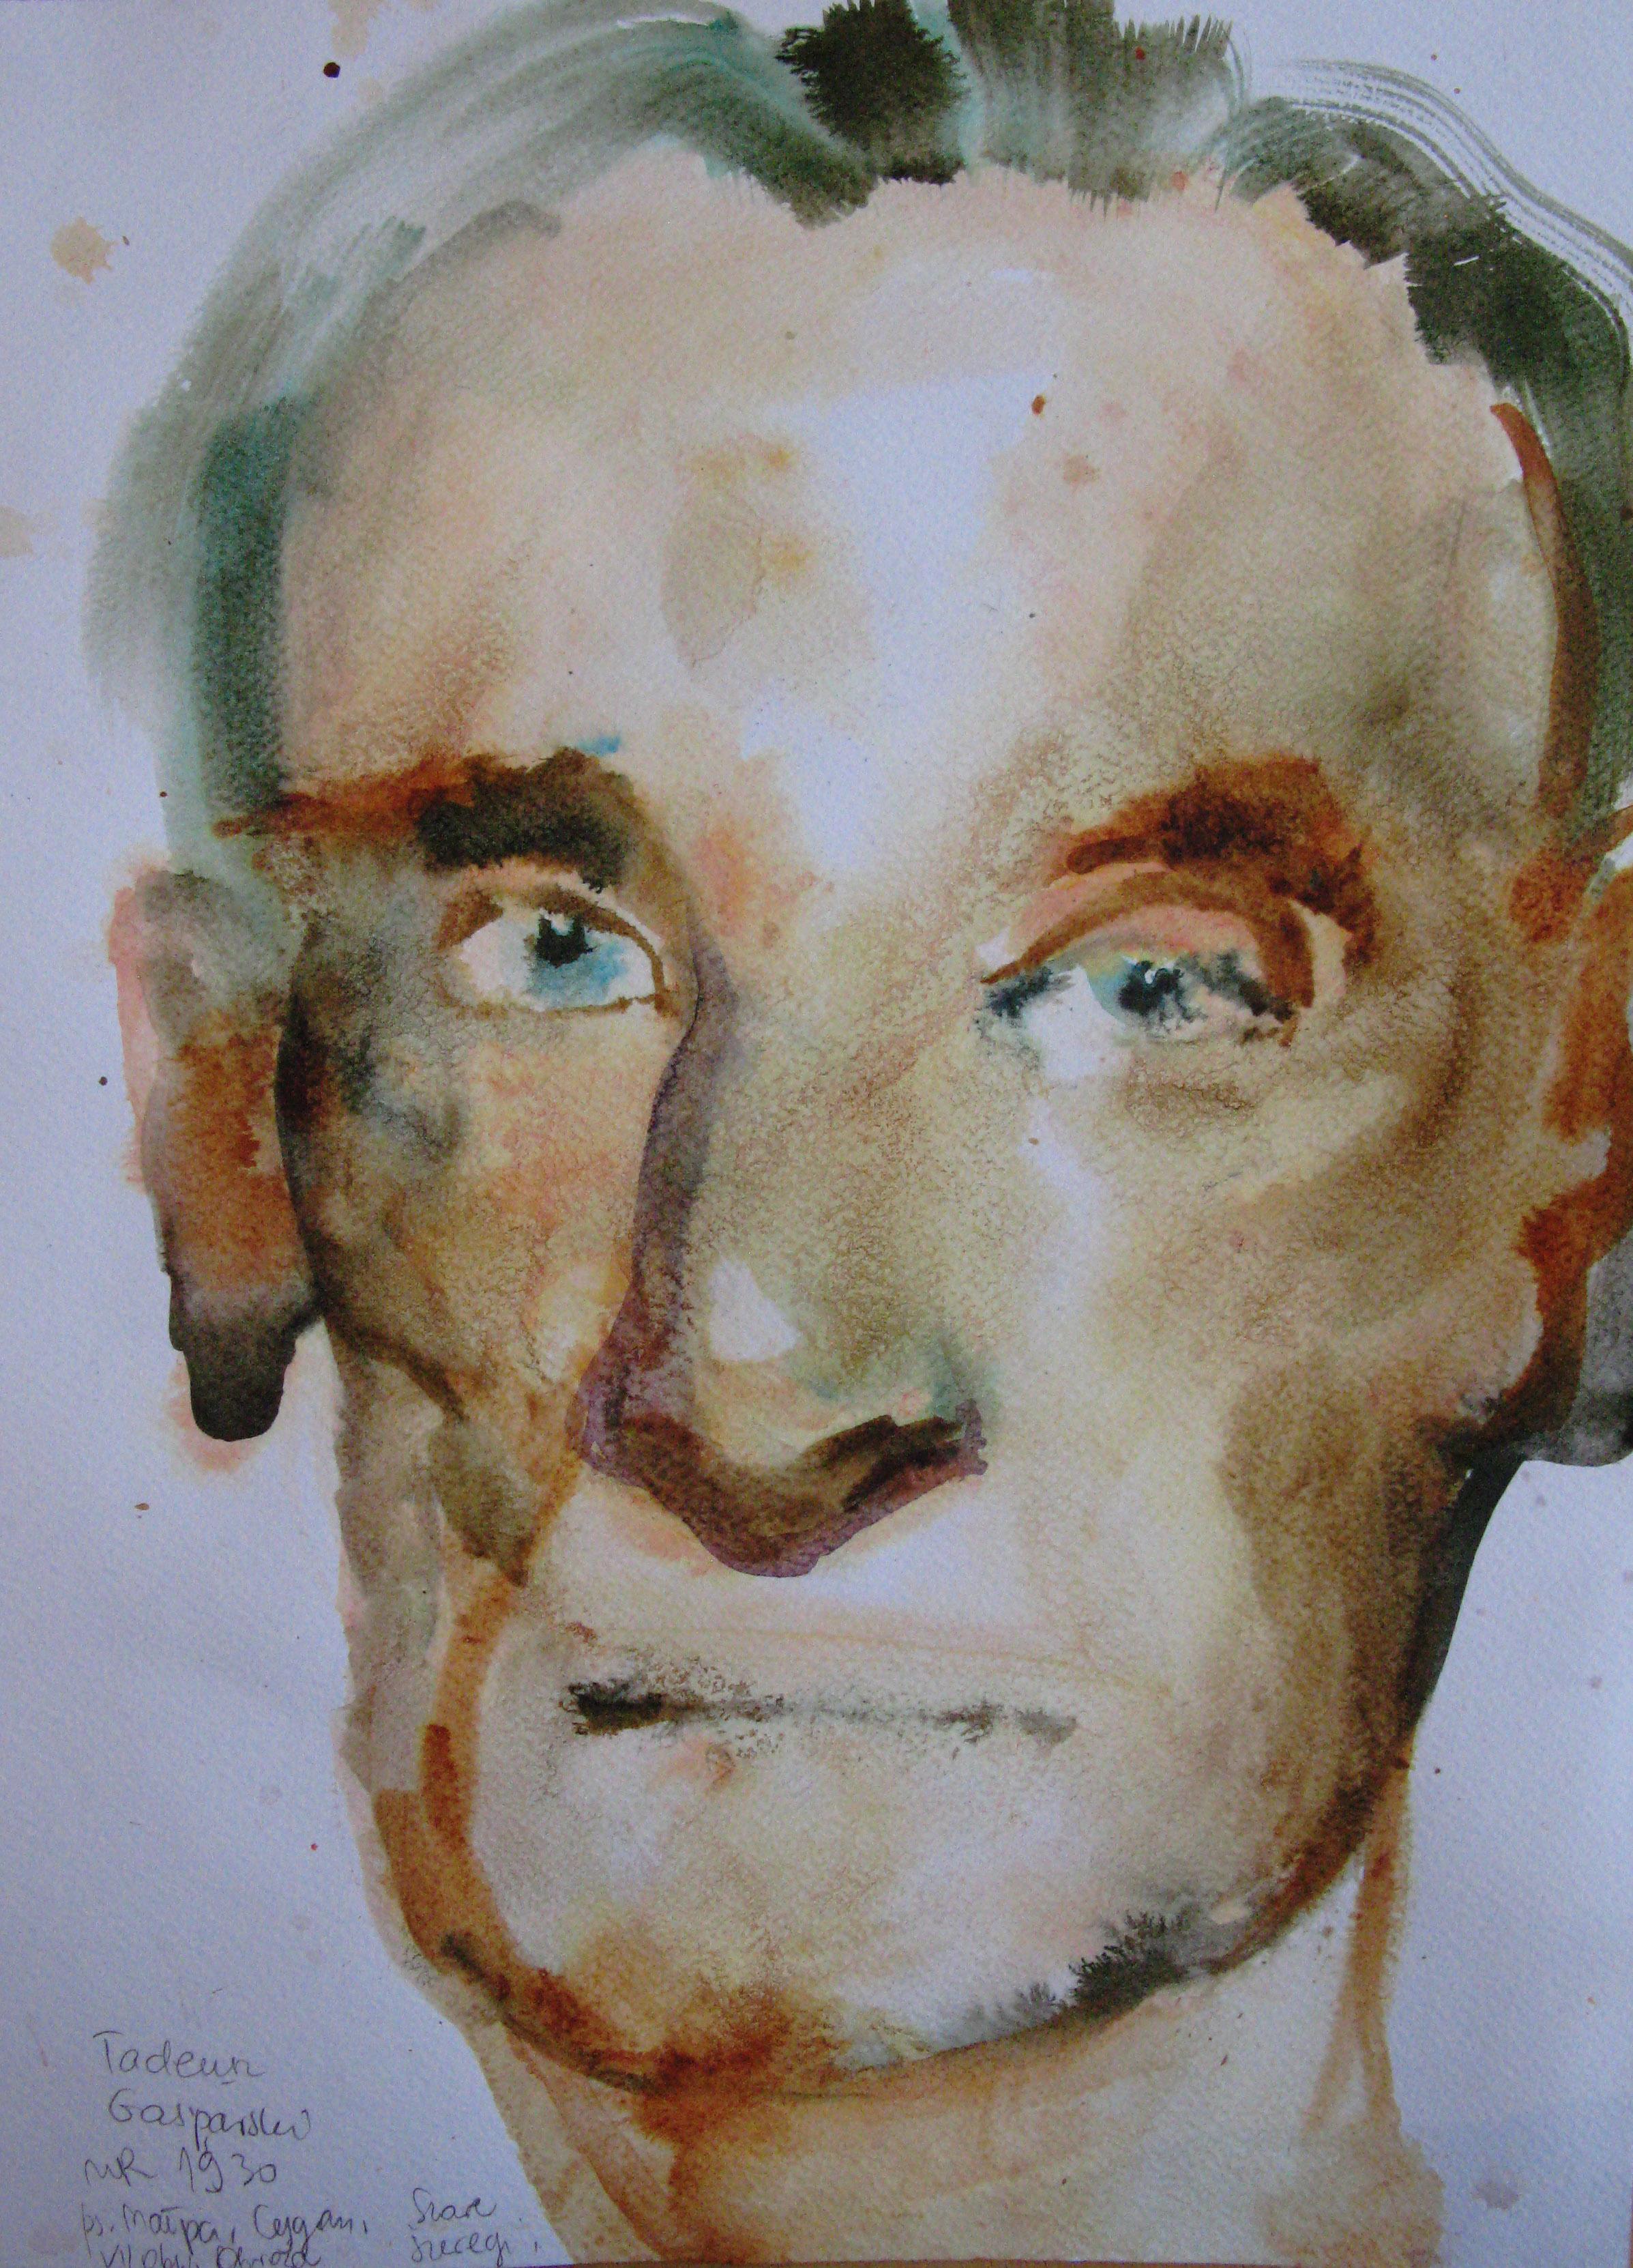 ID'44,watercolour, ink on paper, 29x22cm (1).jpg